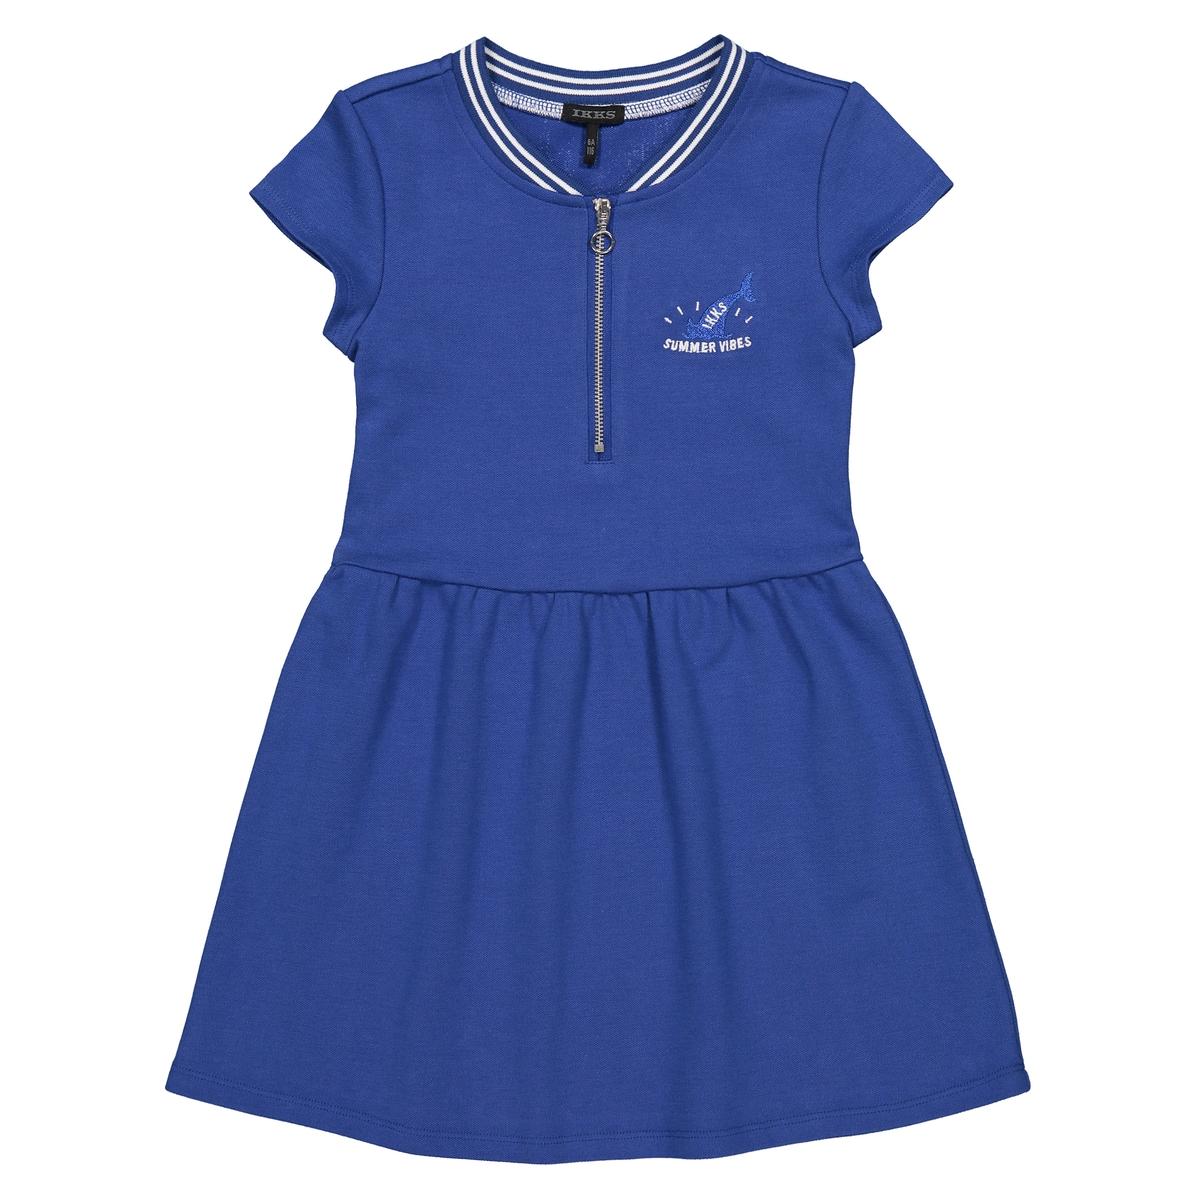 Платье La Redoute С короткими рукавами 12 лет -150 см синий